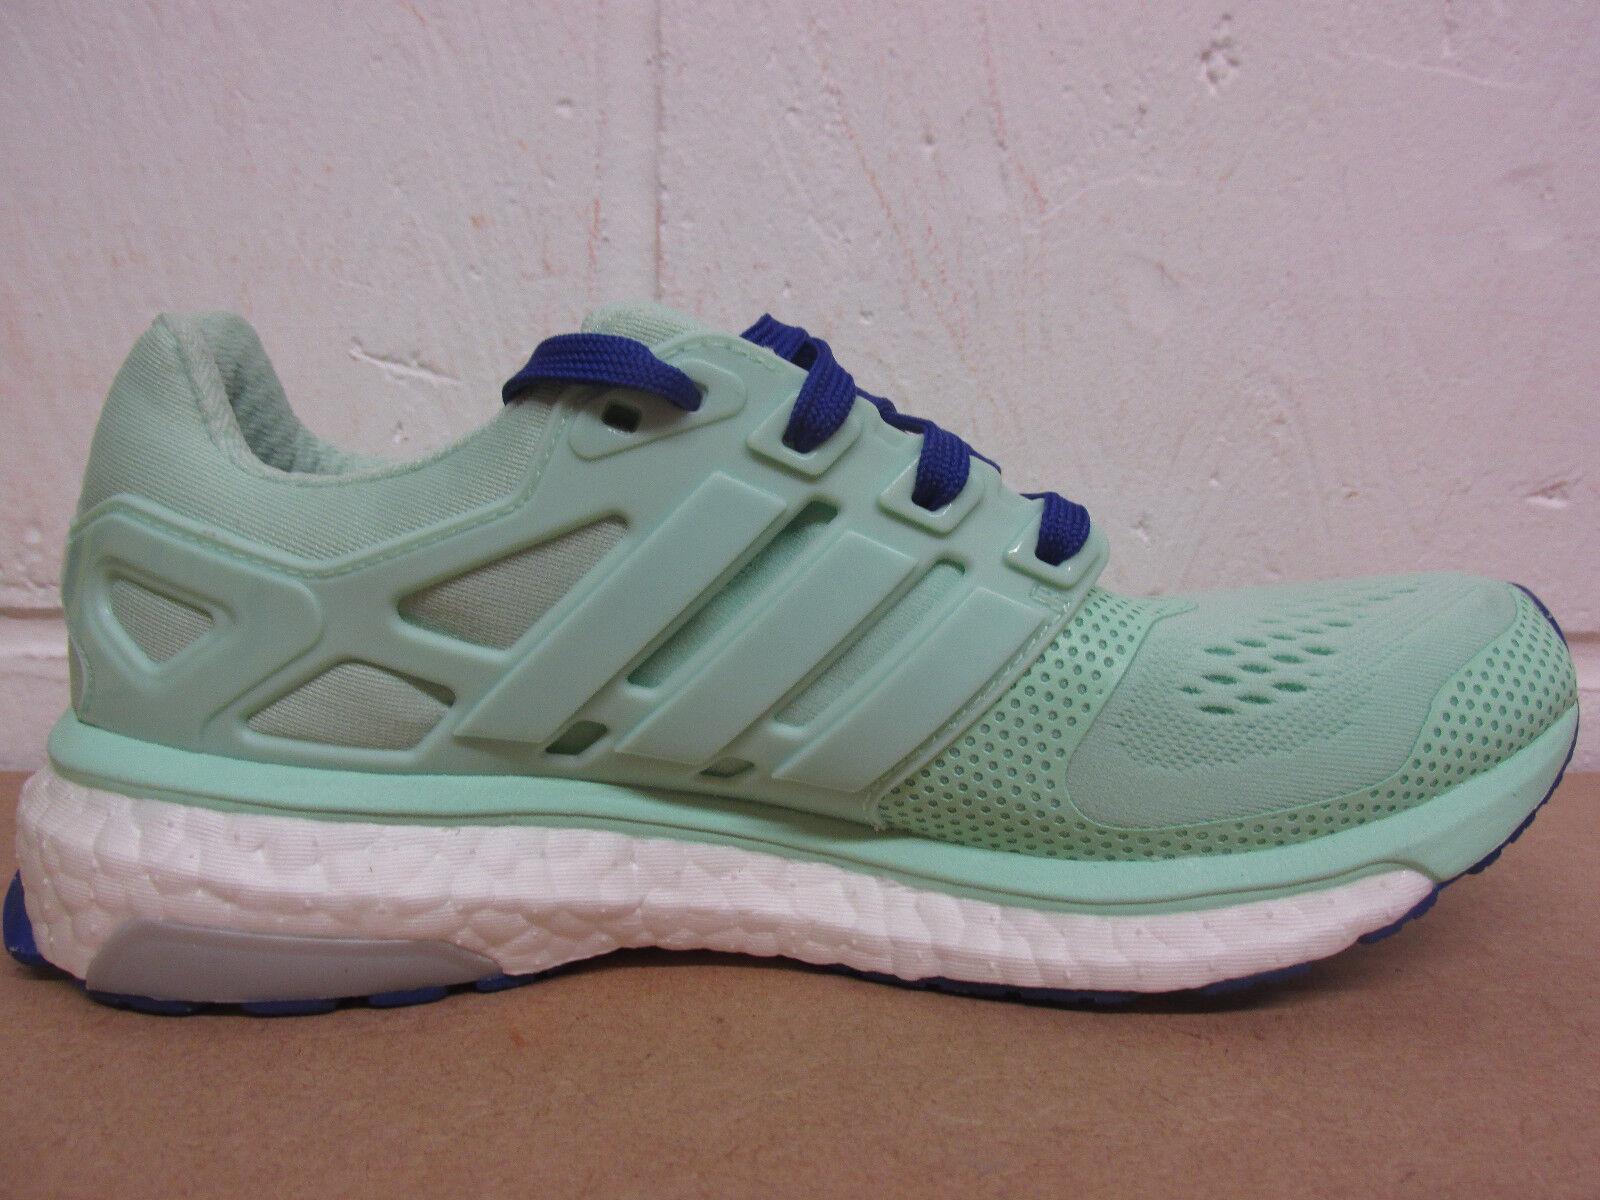 Adidas laufen energieschubs esm laufen Adidas frauen s83147 ausbilder turnschuhe e57ecc